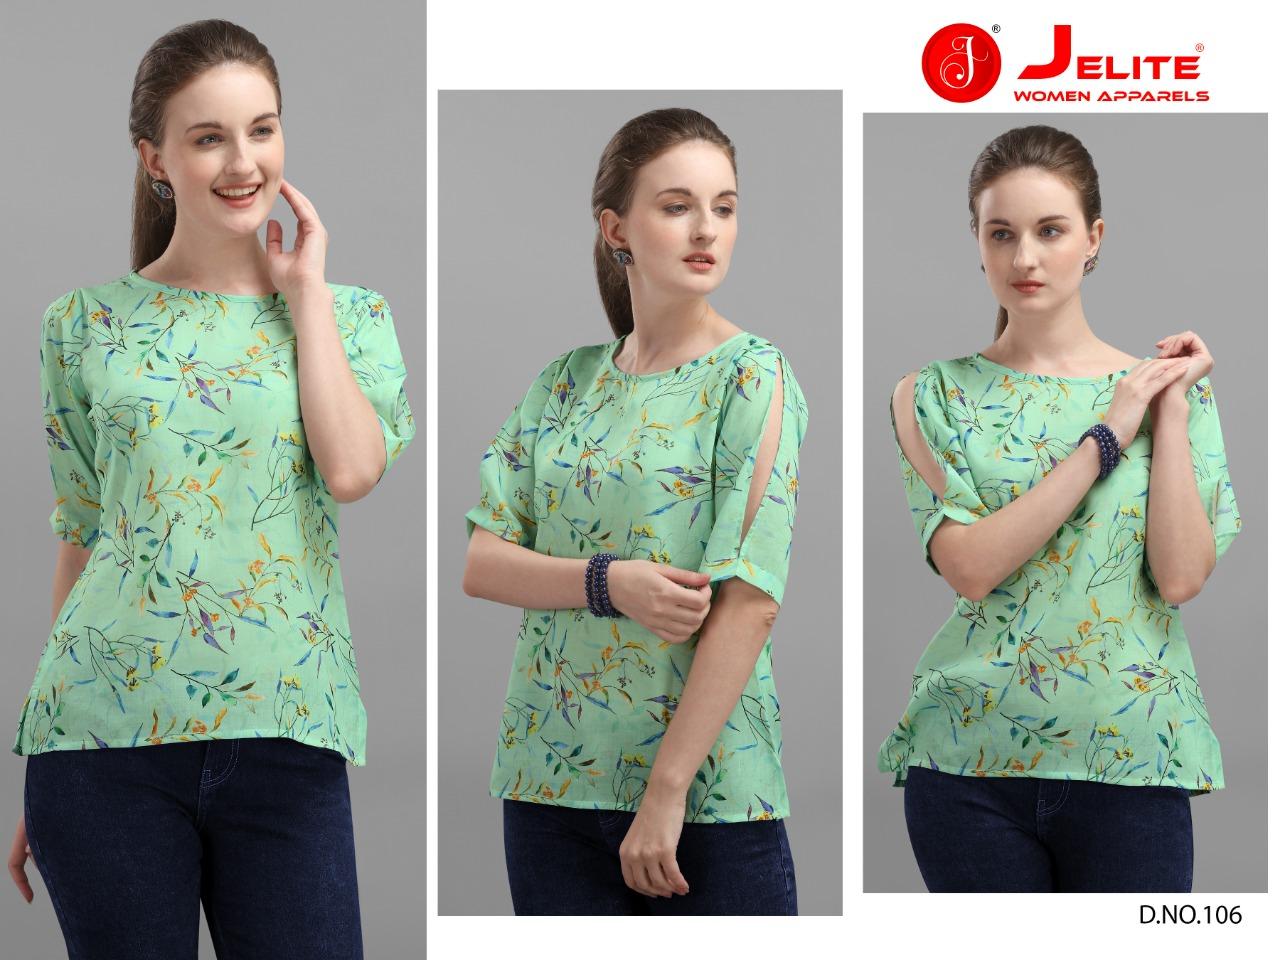 Jelite Marigold Tops Wholesale Catalog 8 Pcs 7 - Jelite Marigold Tops Wholesale Catalog 8 Pcs